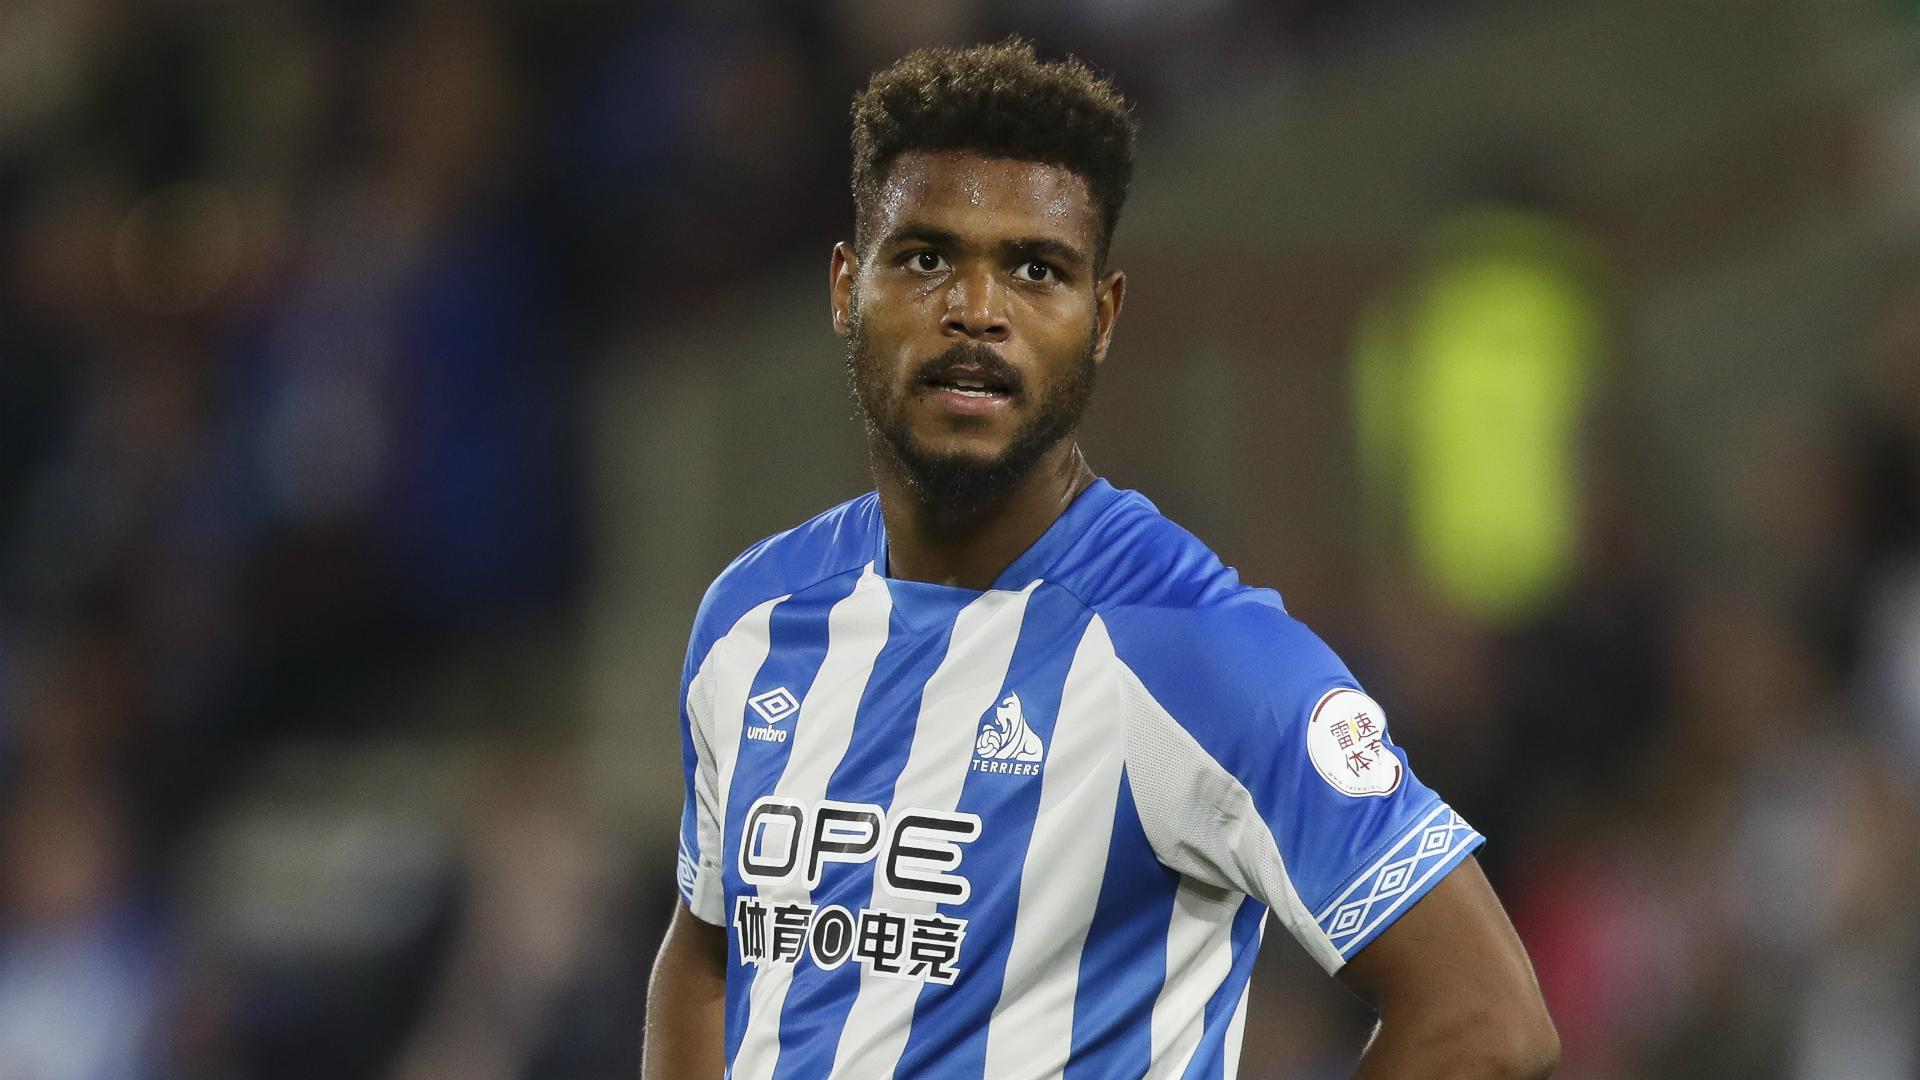 Huddersfield boss Wagner defends misfiring Mounie